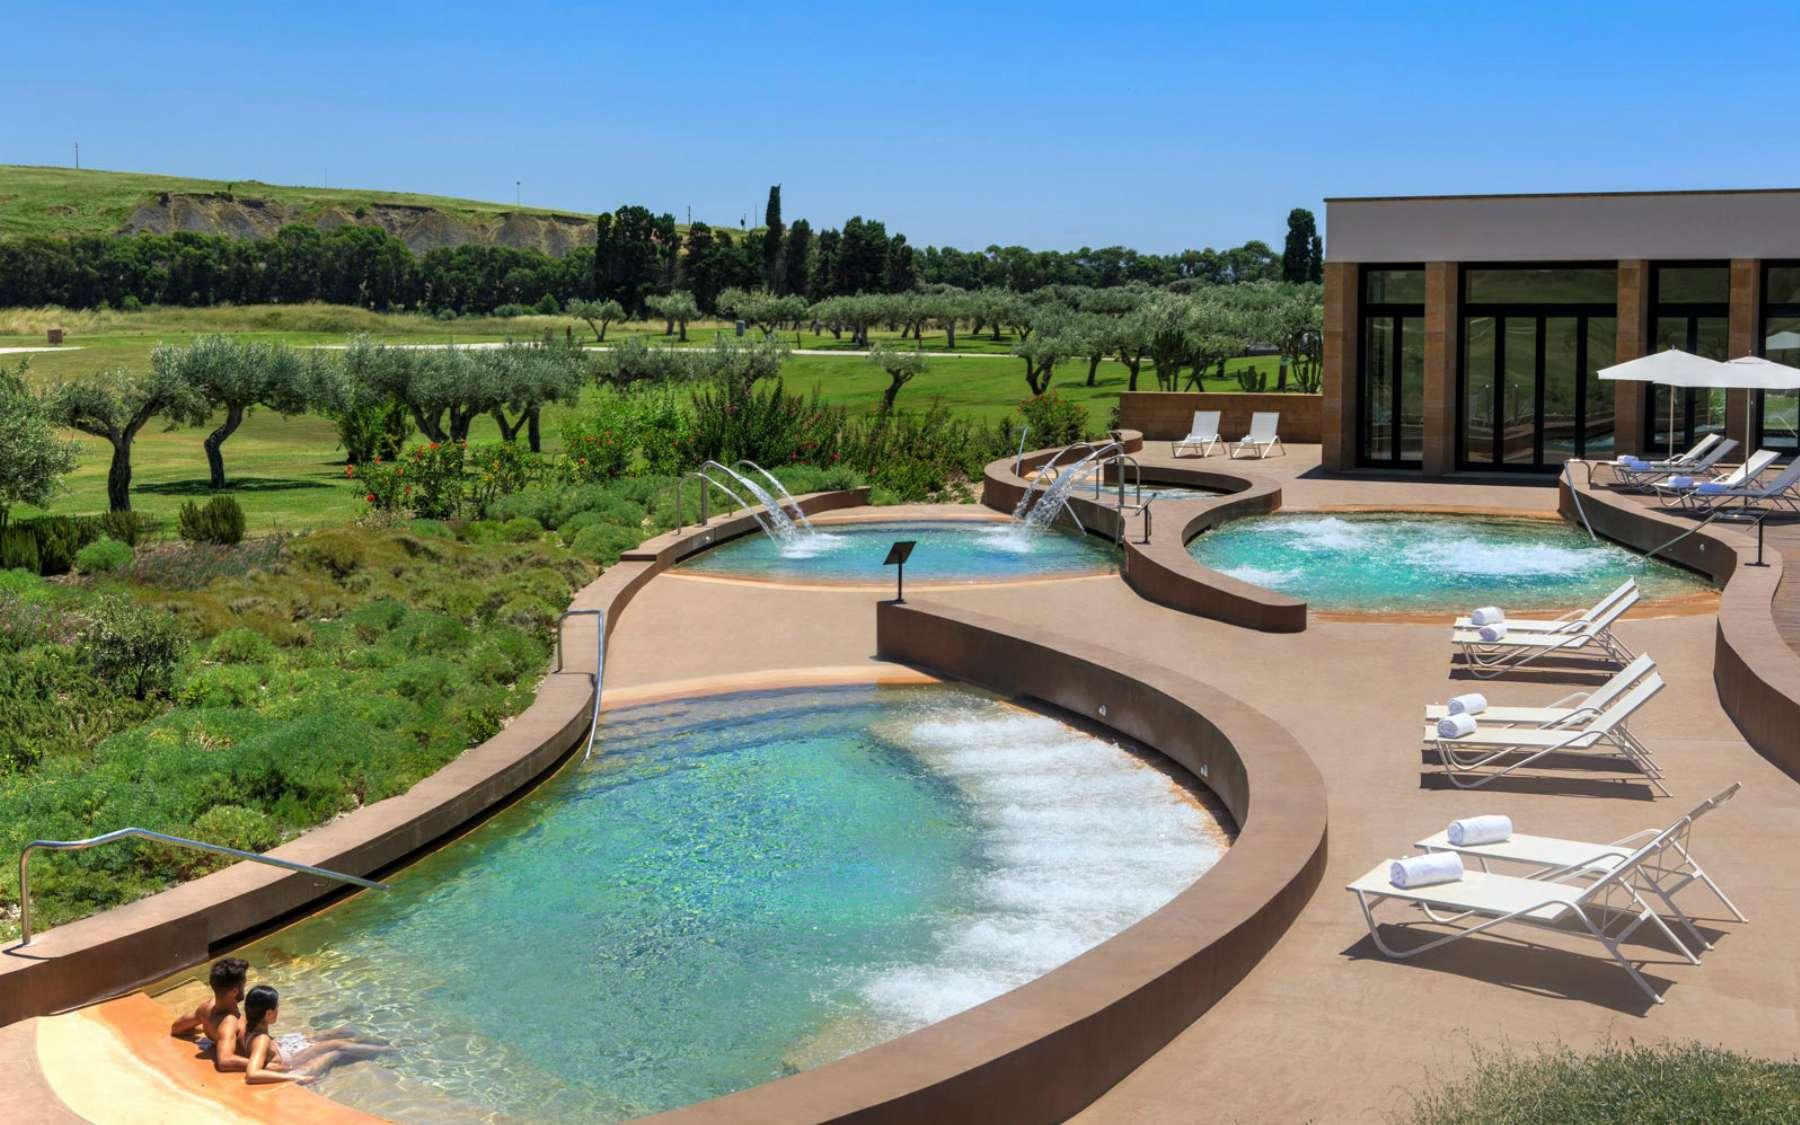 Verdura Thalasso Pools